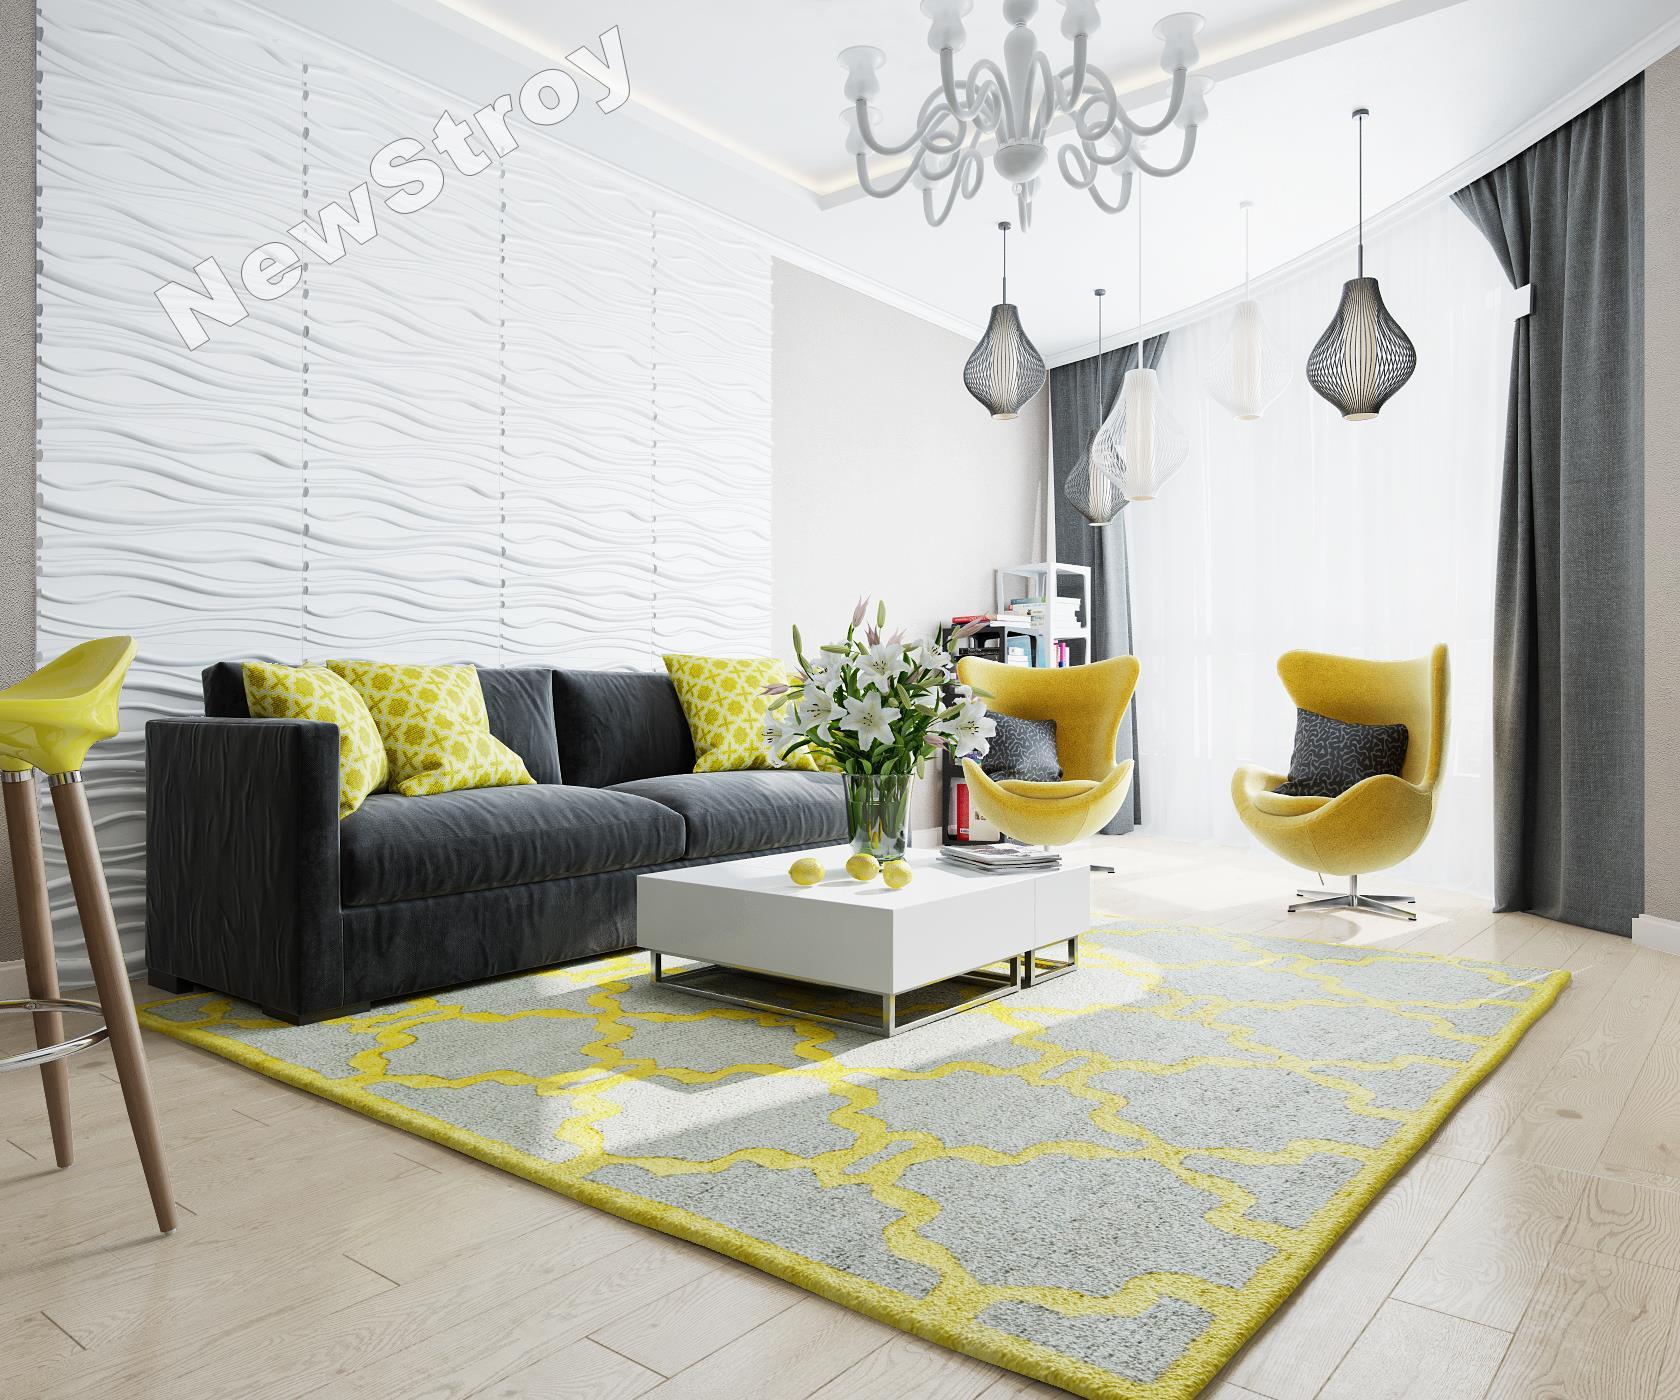 Проектный дизайн квартиры